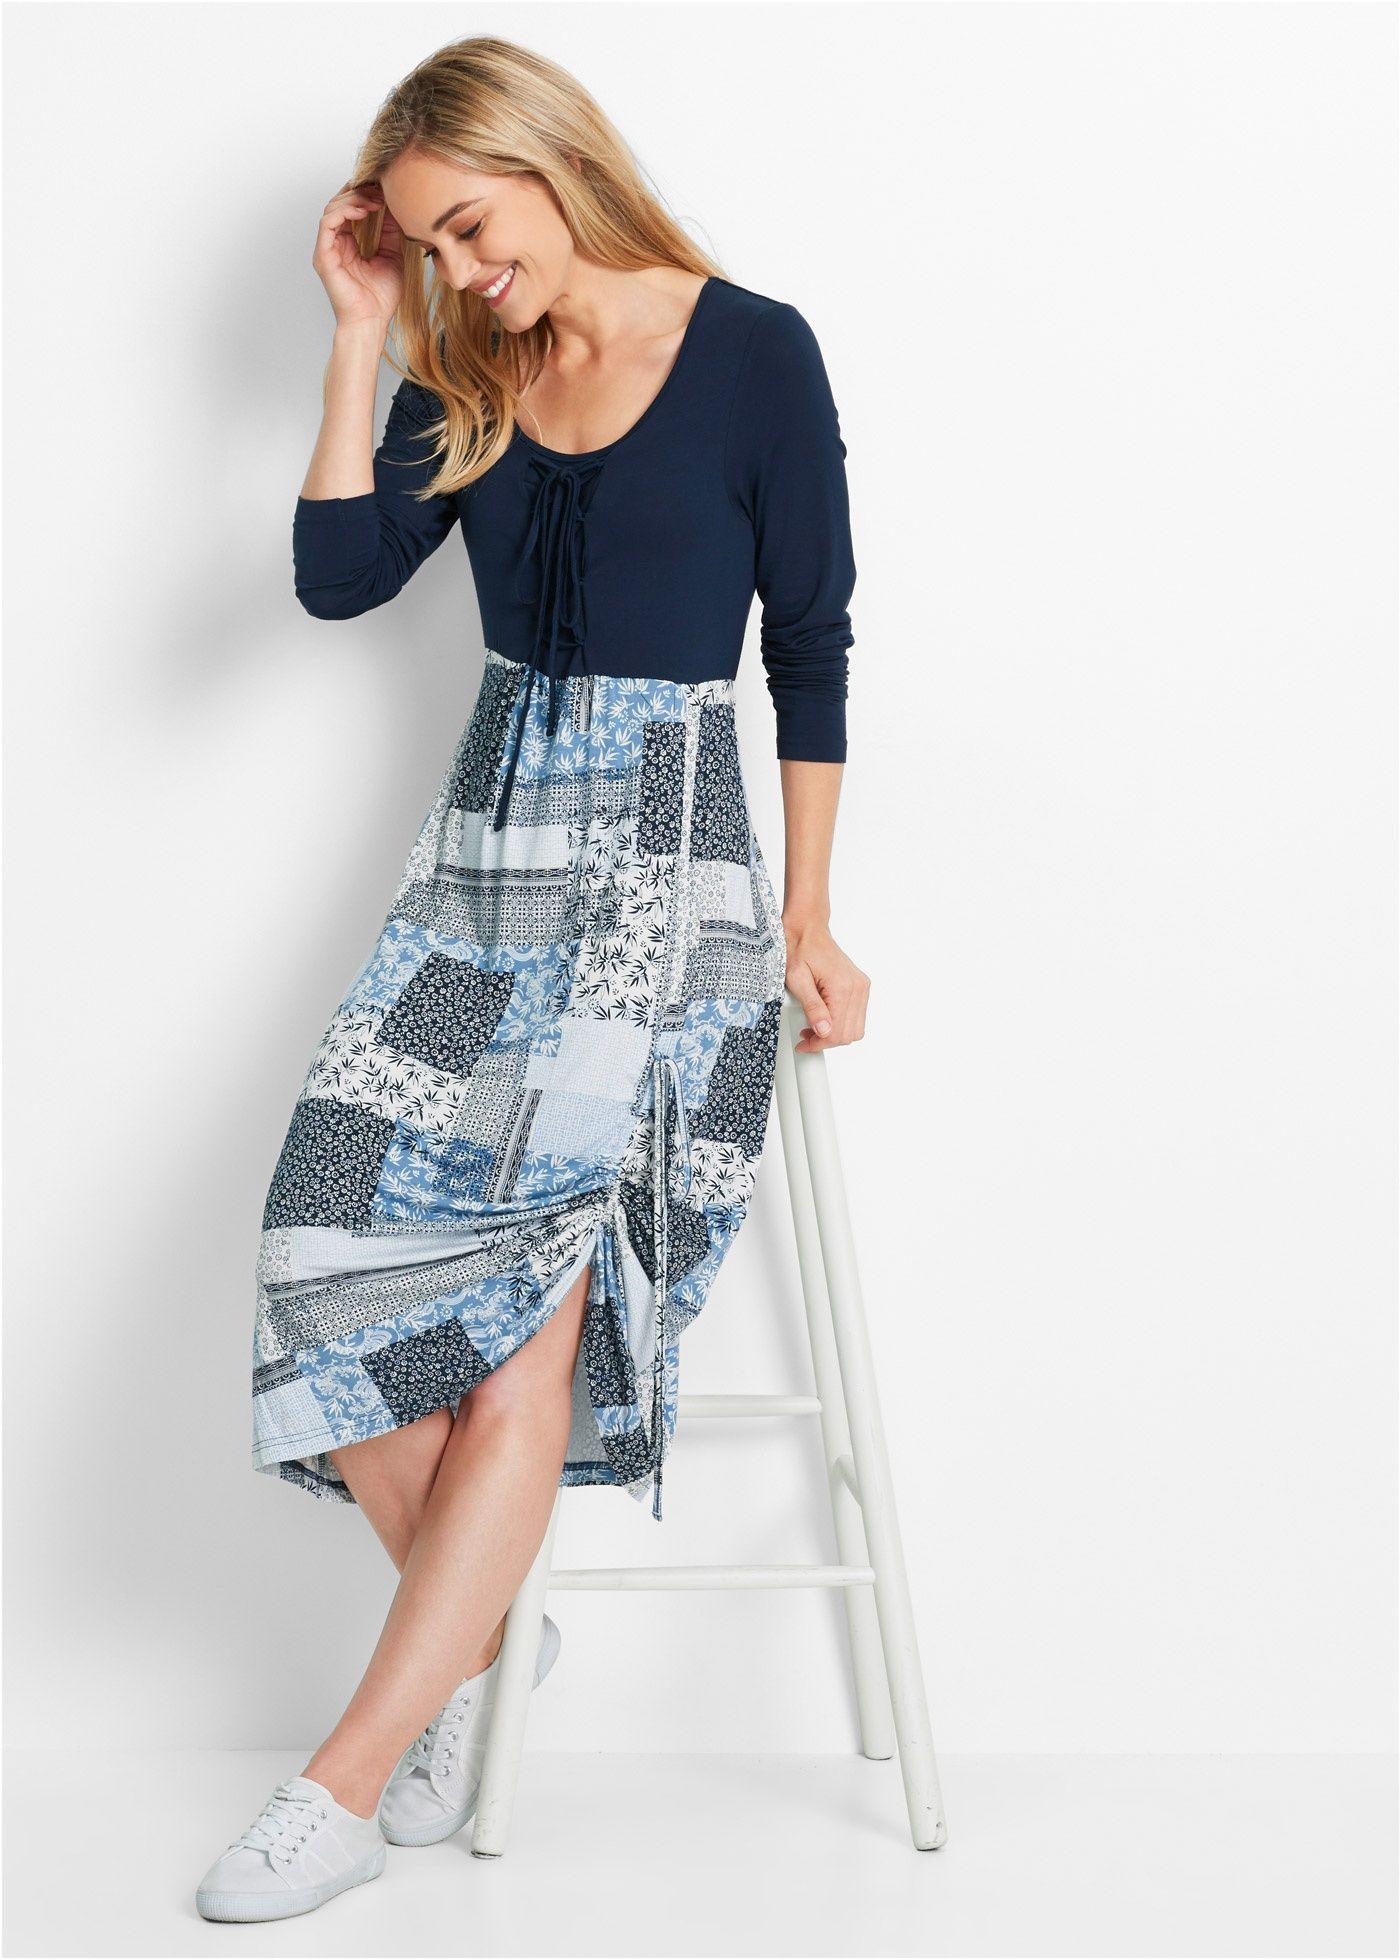 e91154cf8a7f42 Kleid, Langarm dunkelblau bedruckt - bpc bonprix collection jetzt im Online  Shop von bonprix.